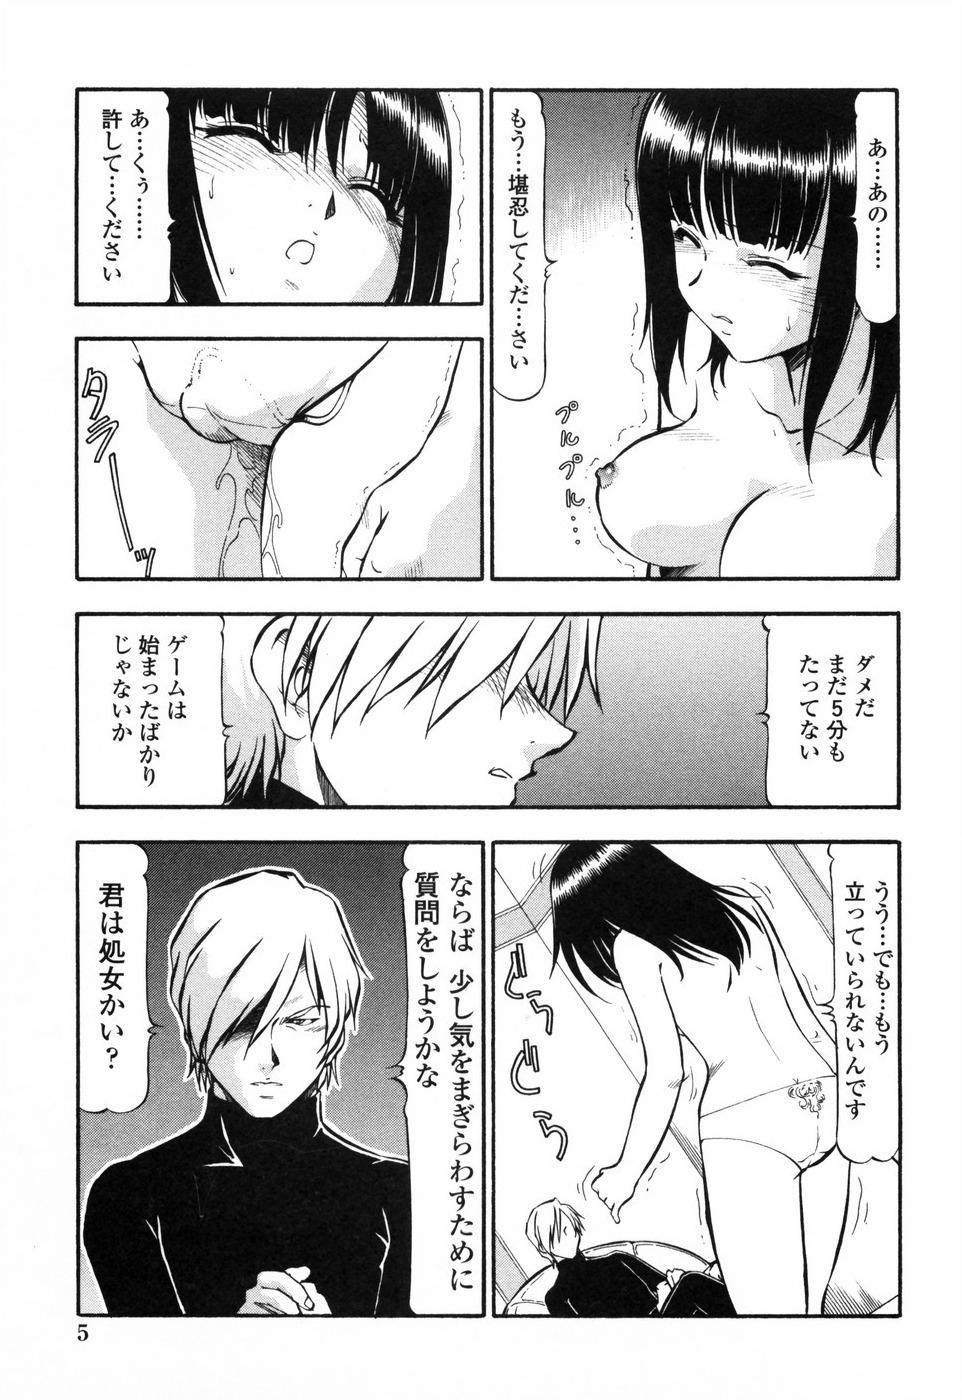 Kichiku Houteishiki - Equation of brutal person 10